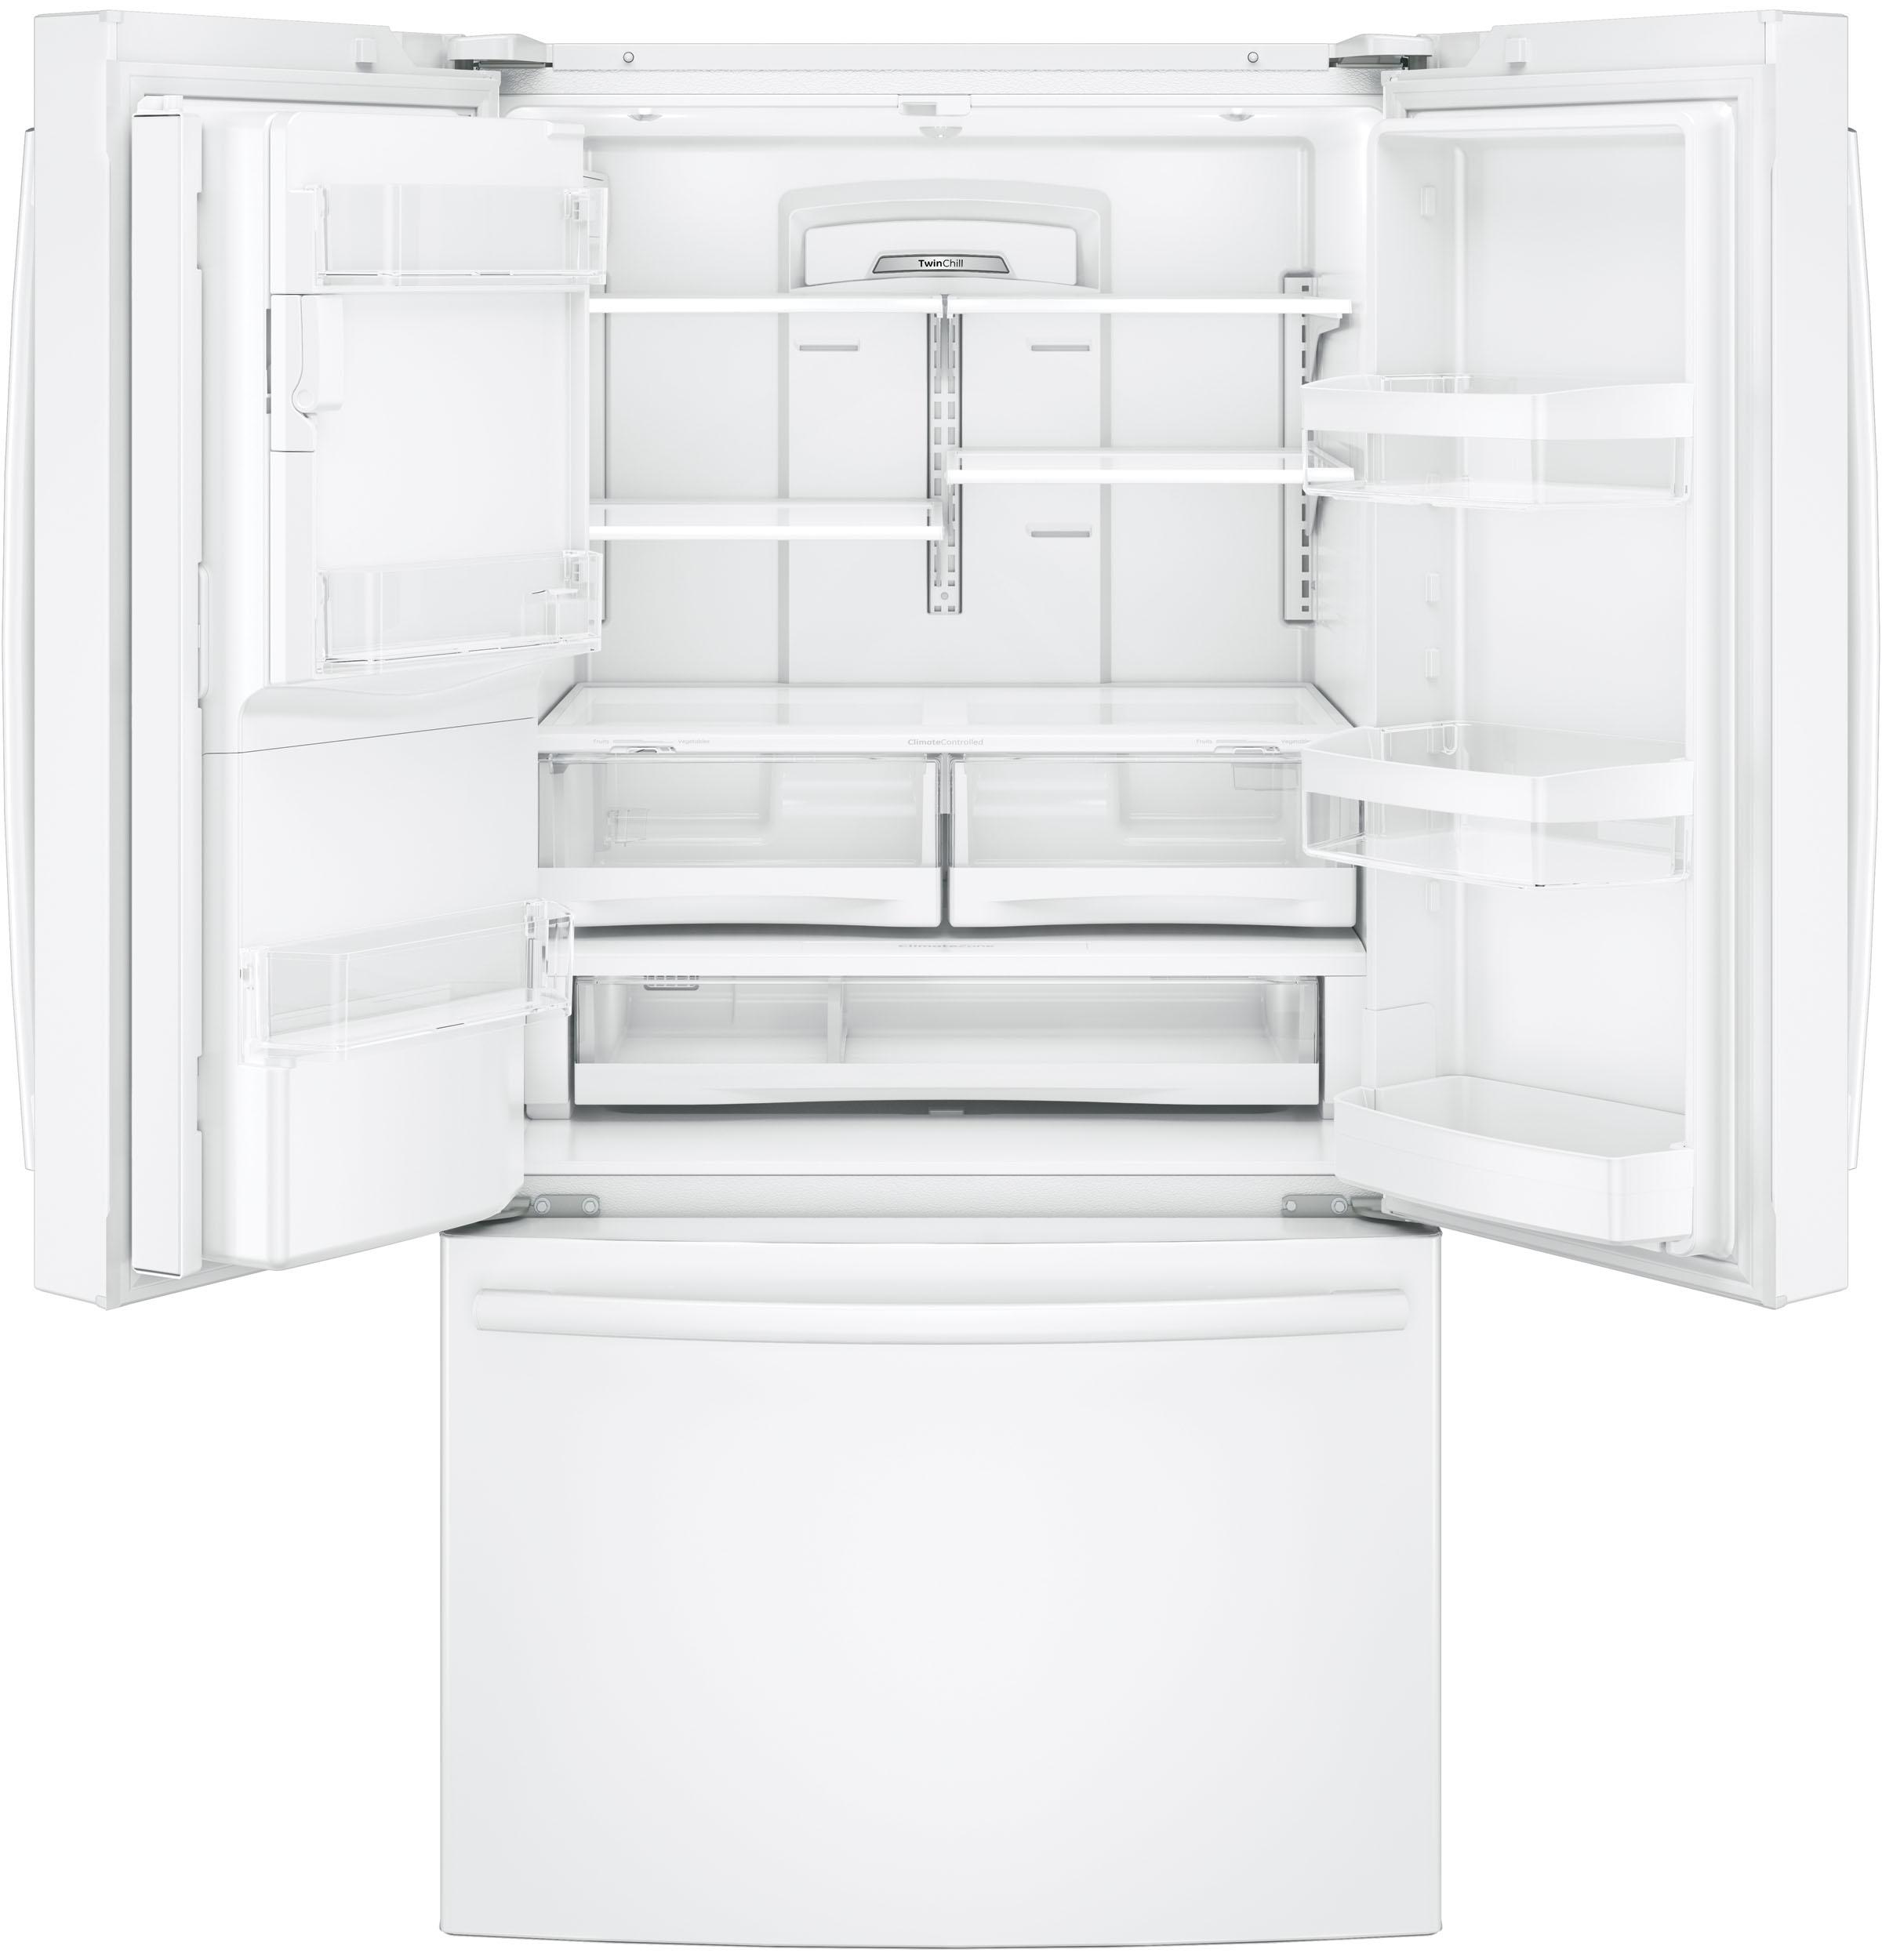 GE Appliances GFE28GGKWW 27.8 cu. ft. French Door Refrigerator - White